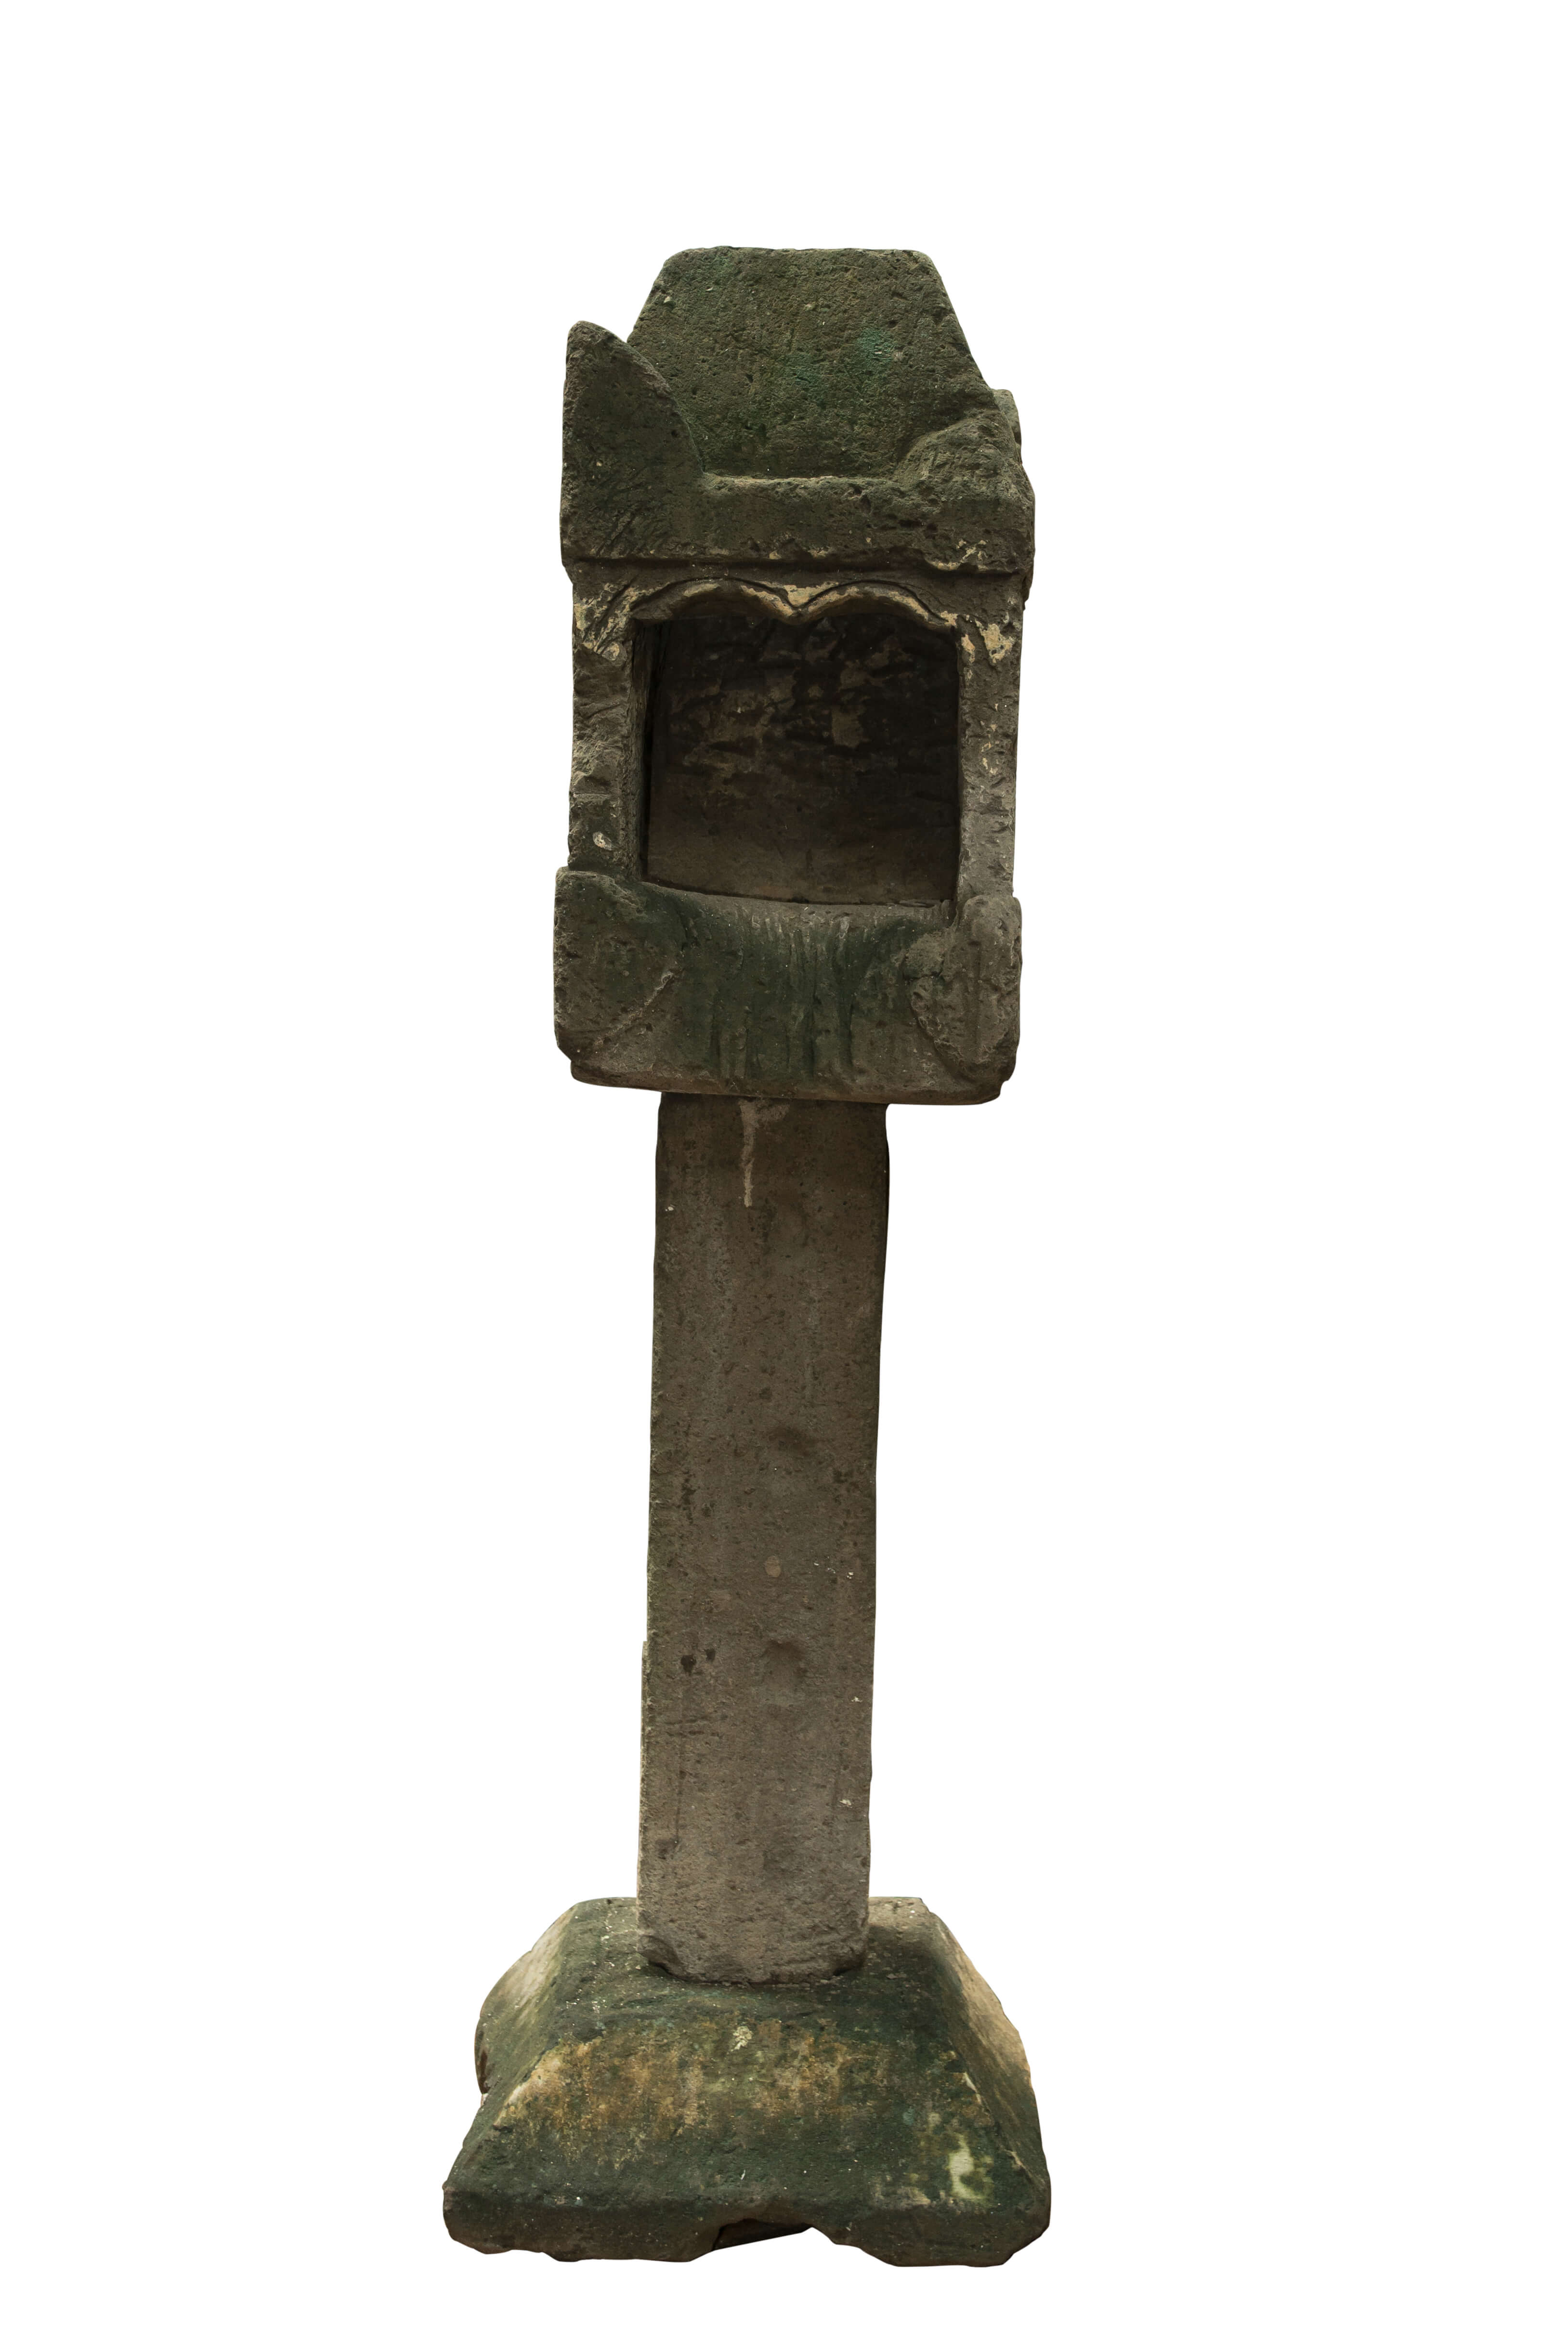 Balinese Lantern in limestone